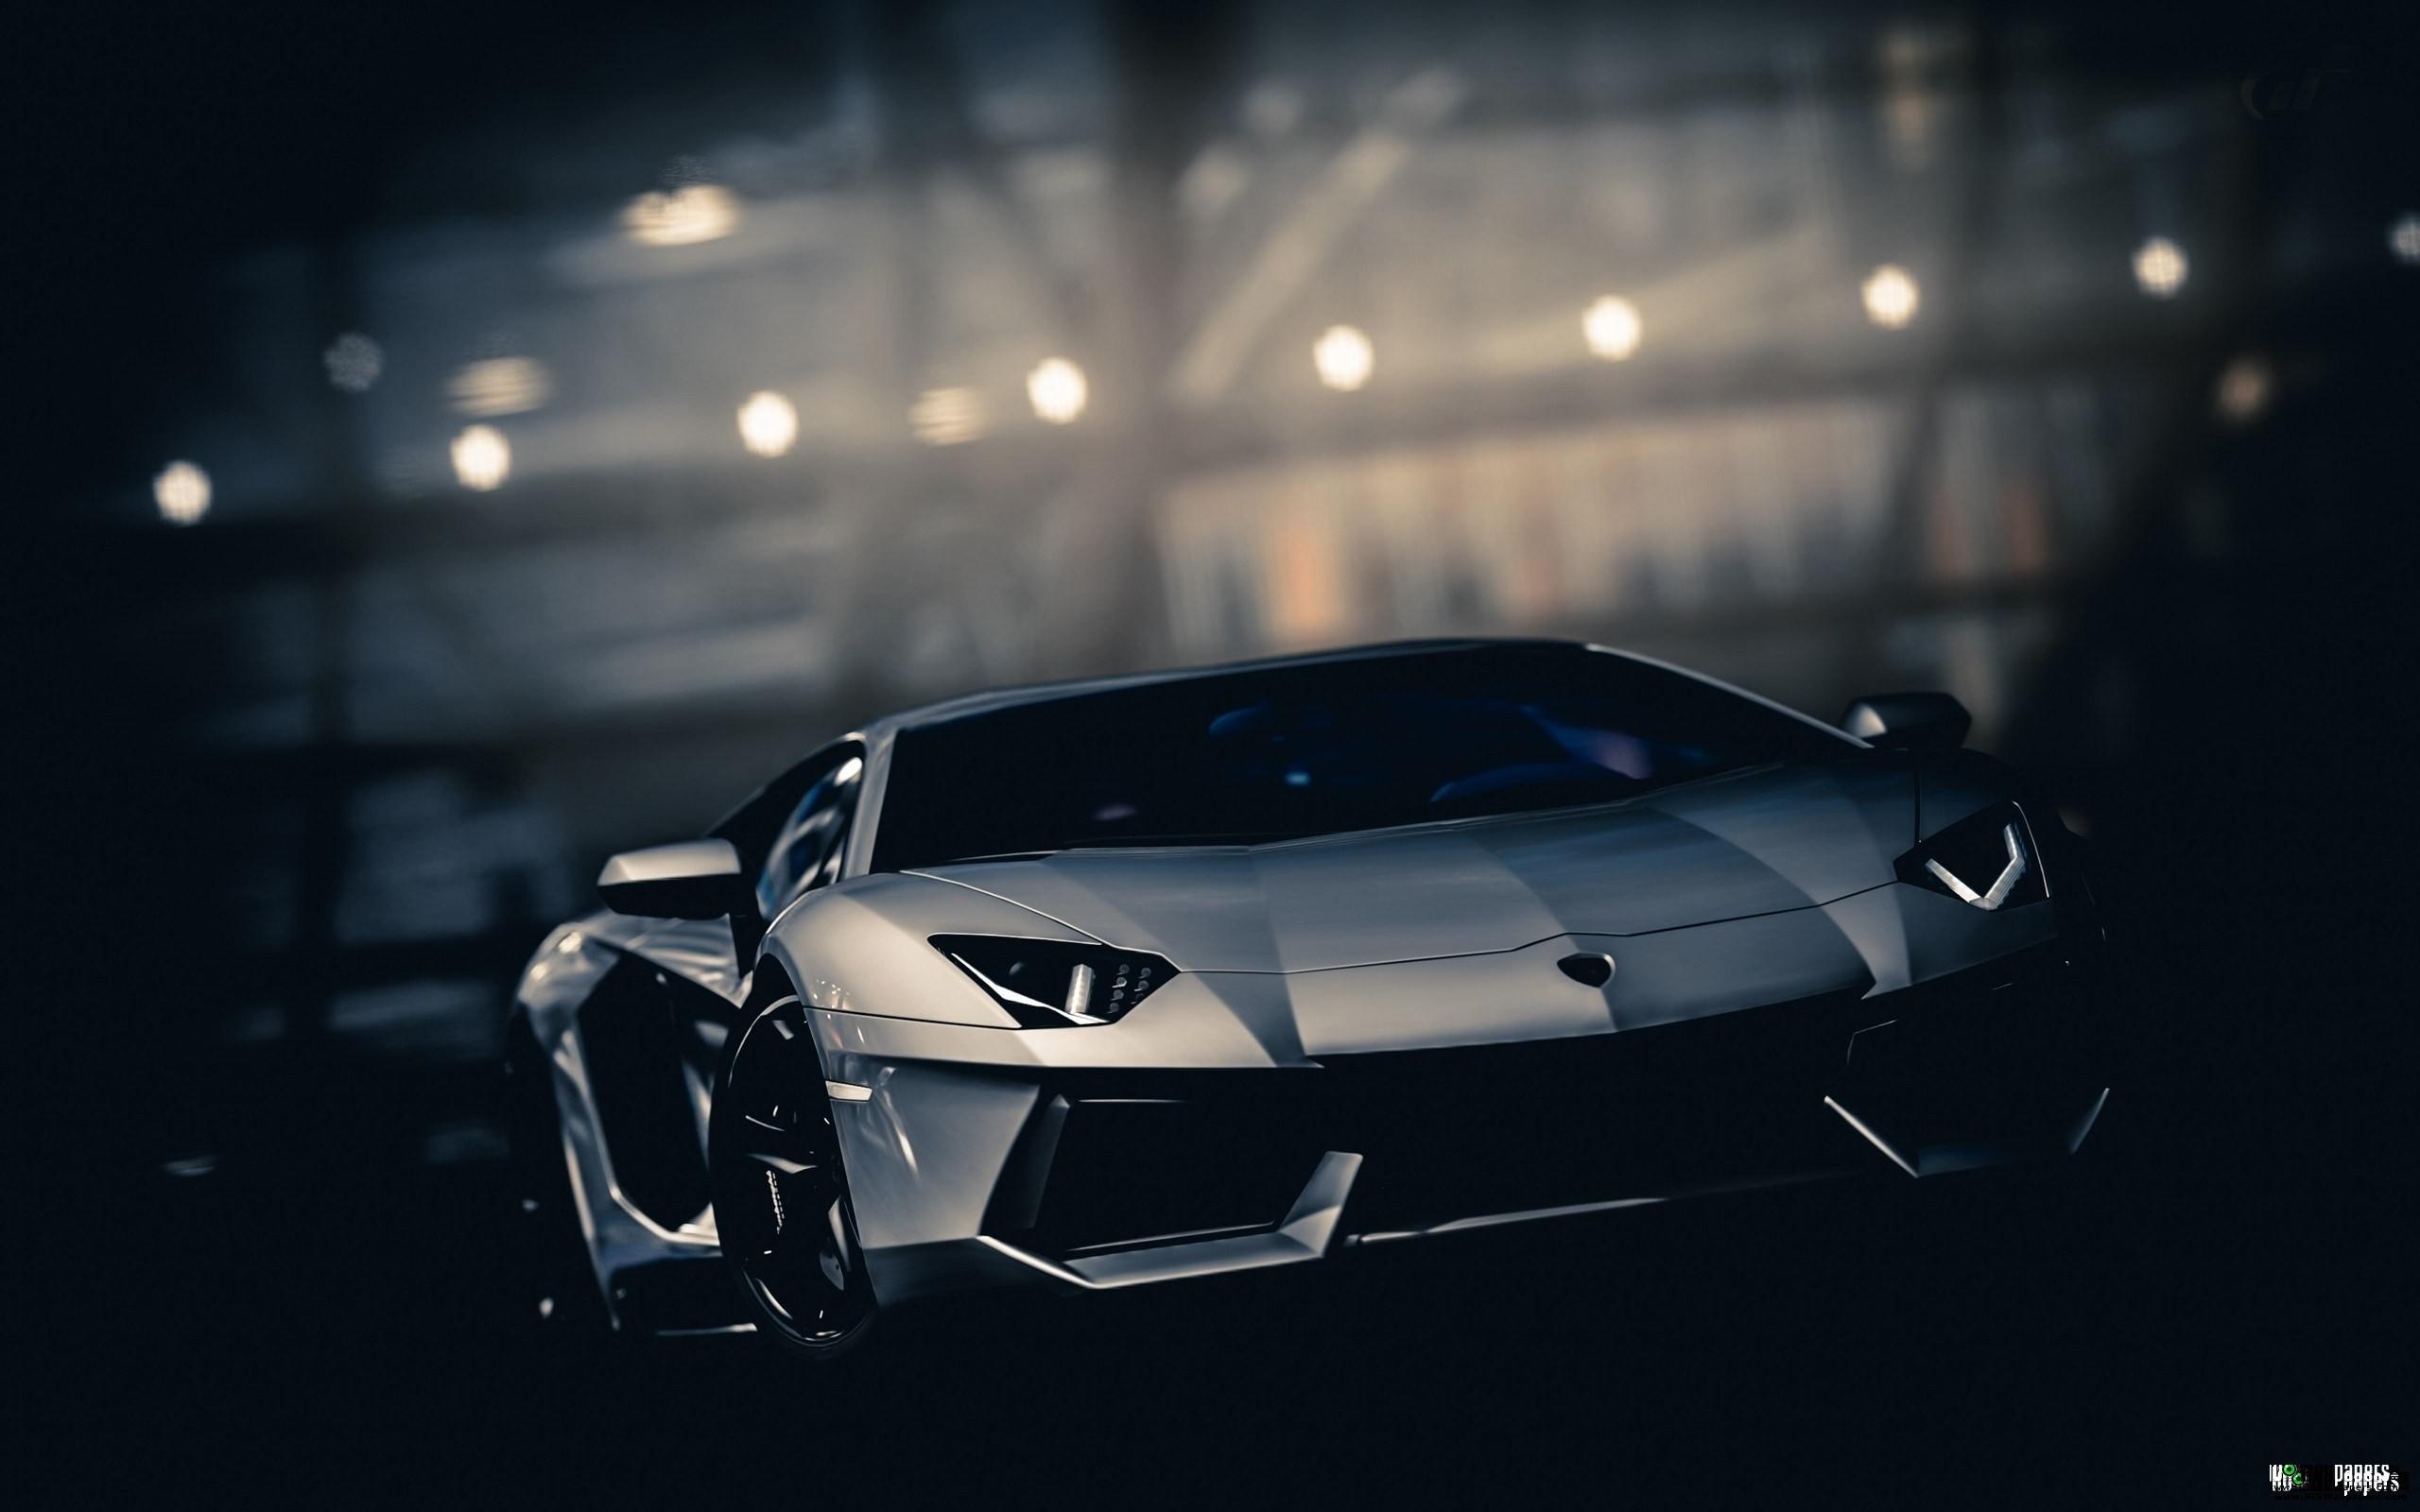 Lamborghini Live Wallpaper For Pc